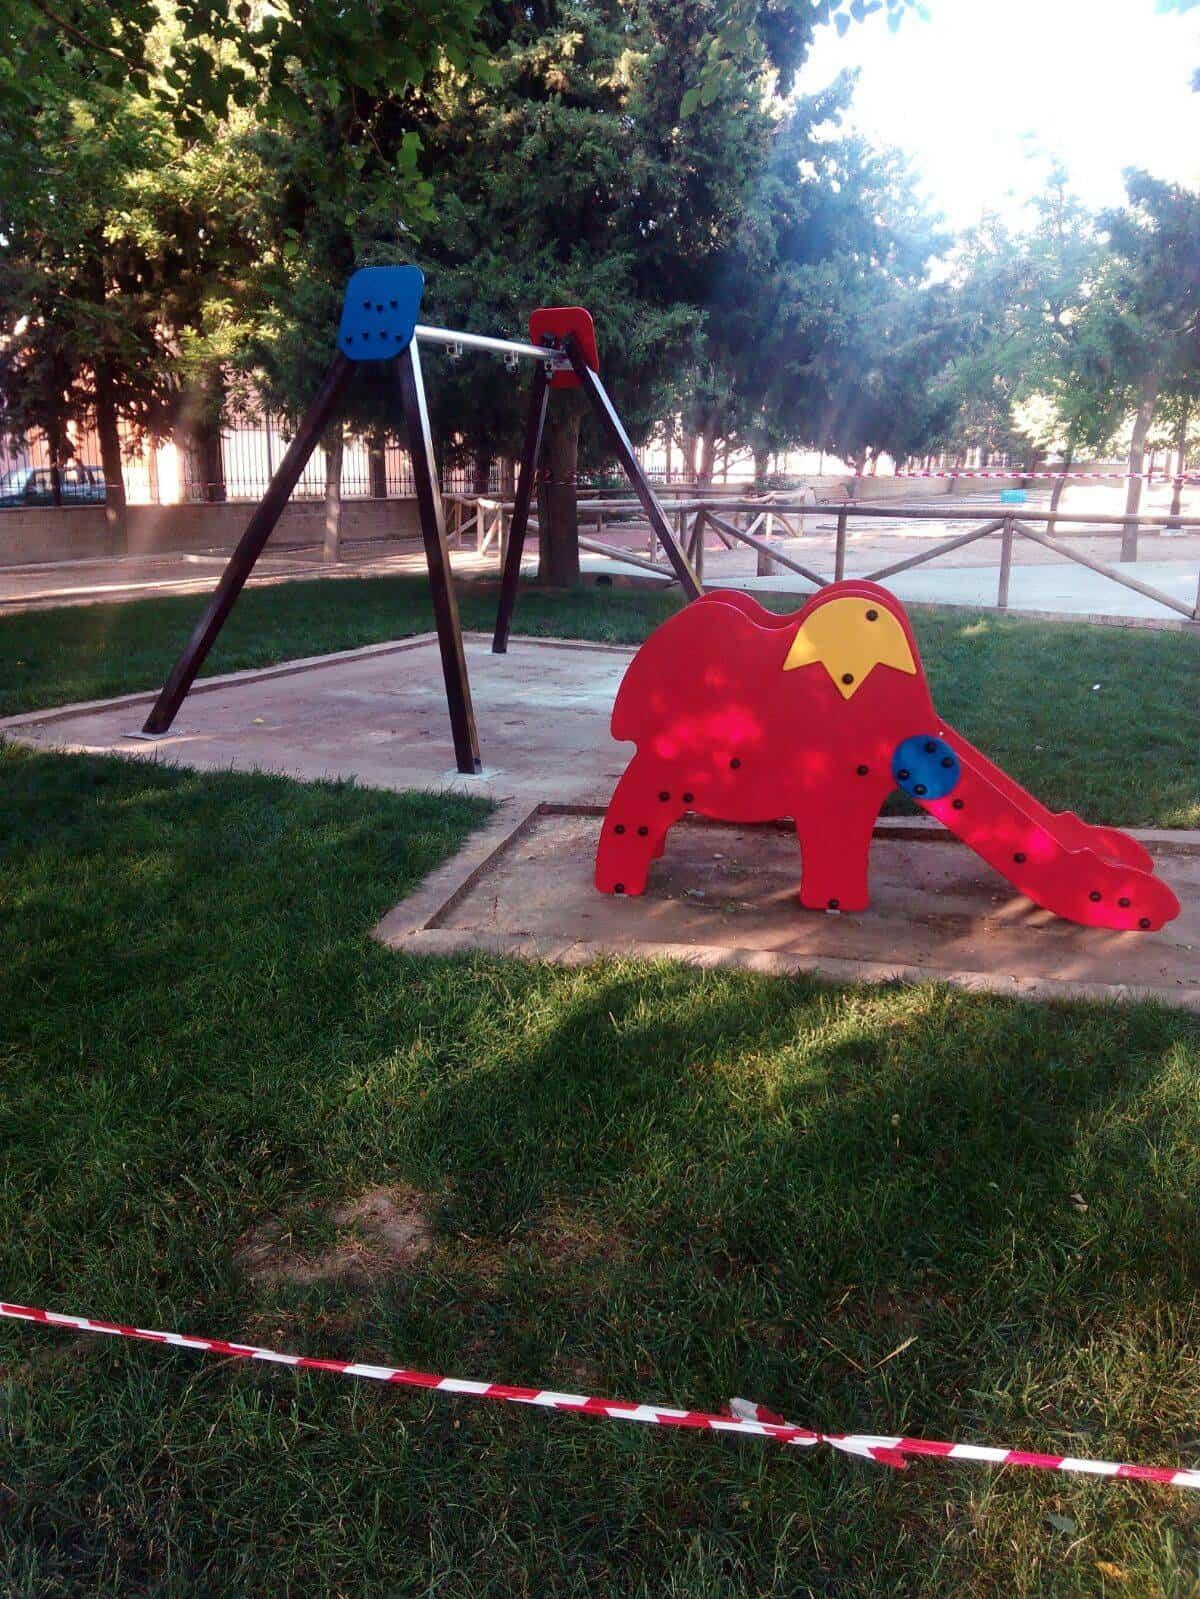 renovada zona infantil parque municipal herencia 4 - Renovada la zona infantil del Parque Municipal de Herencia